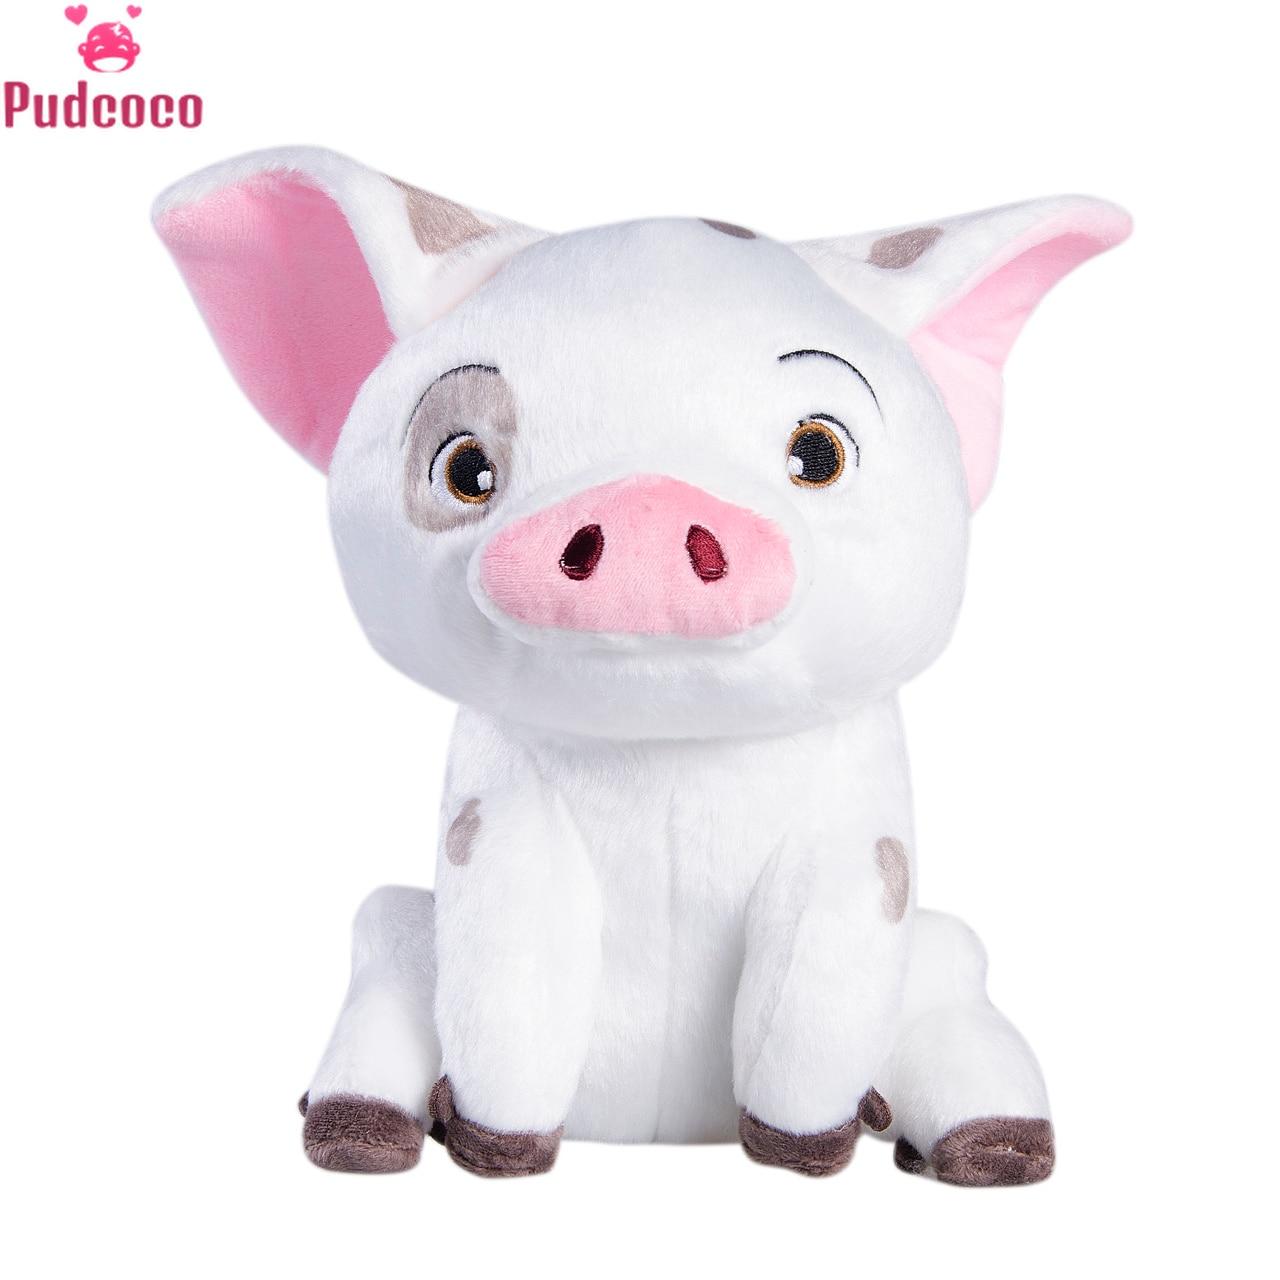 Hot Sale Movie Moana Pet Pig Pua Stuffed Animals Cute Cartoon Plush Dolls Soft 22cm Toys Girls 9 Inch Pet Pig Toy Birthday Gift